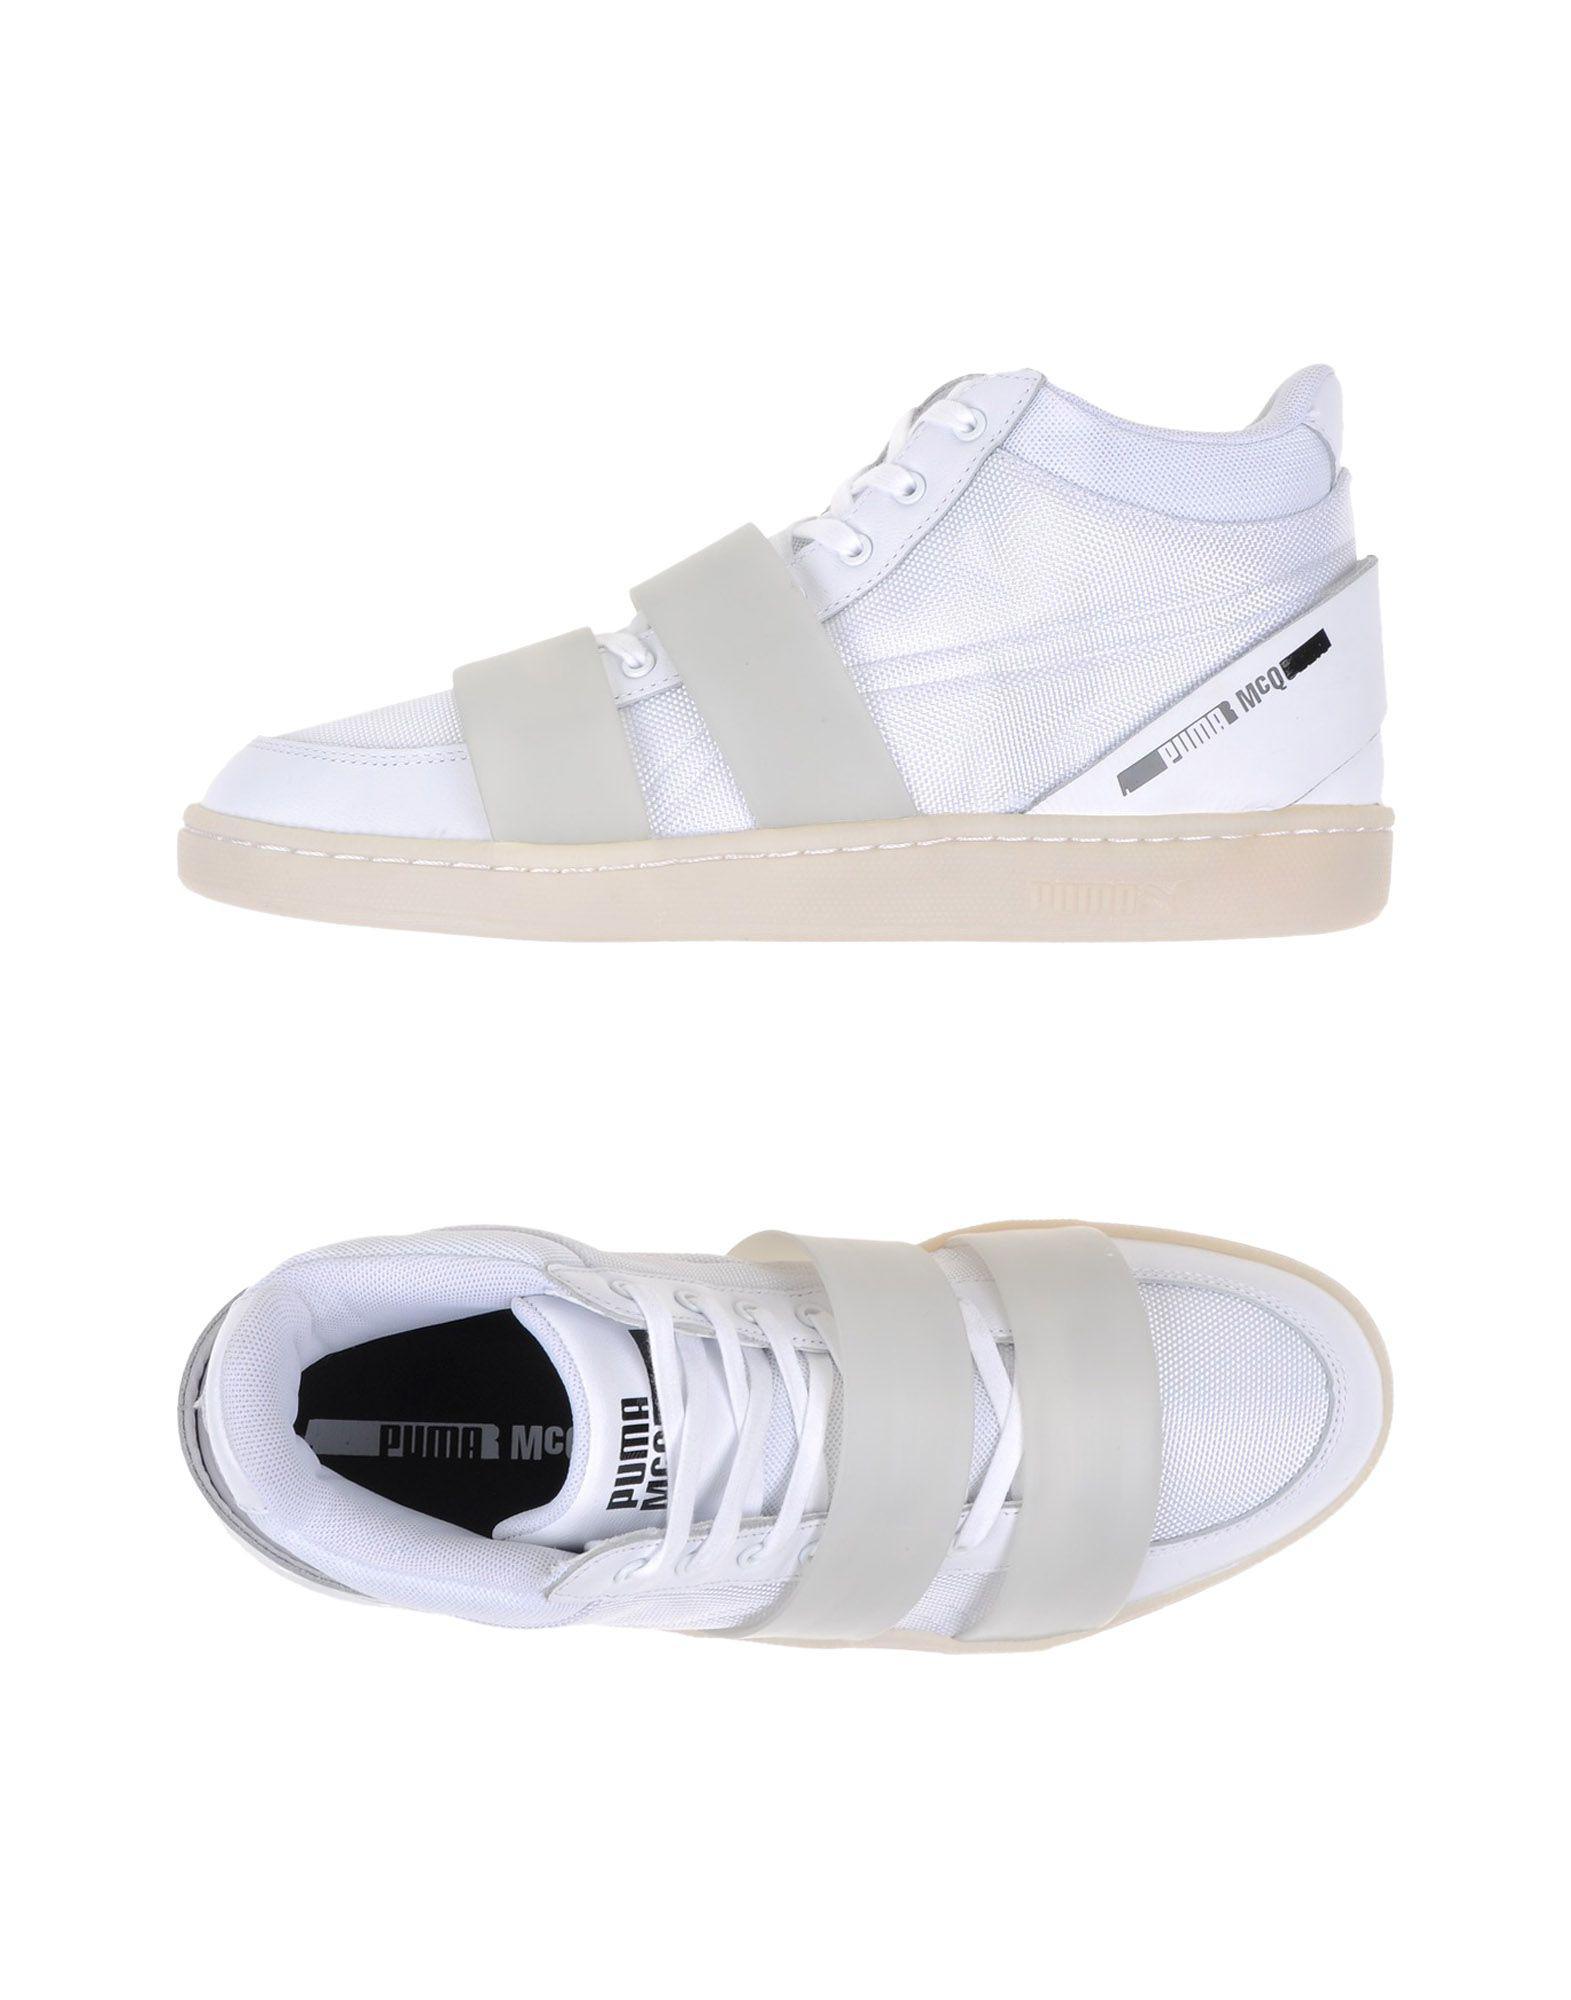 Montantes X Sneakersamp; Tennis Alexander Pour Lyst Mcqueen Puma 3Ac5RLq4jS